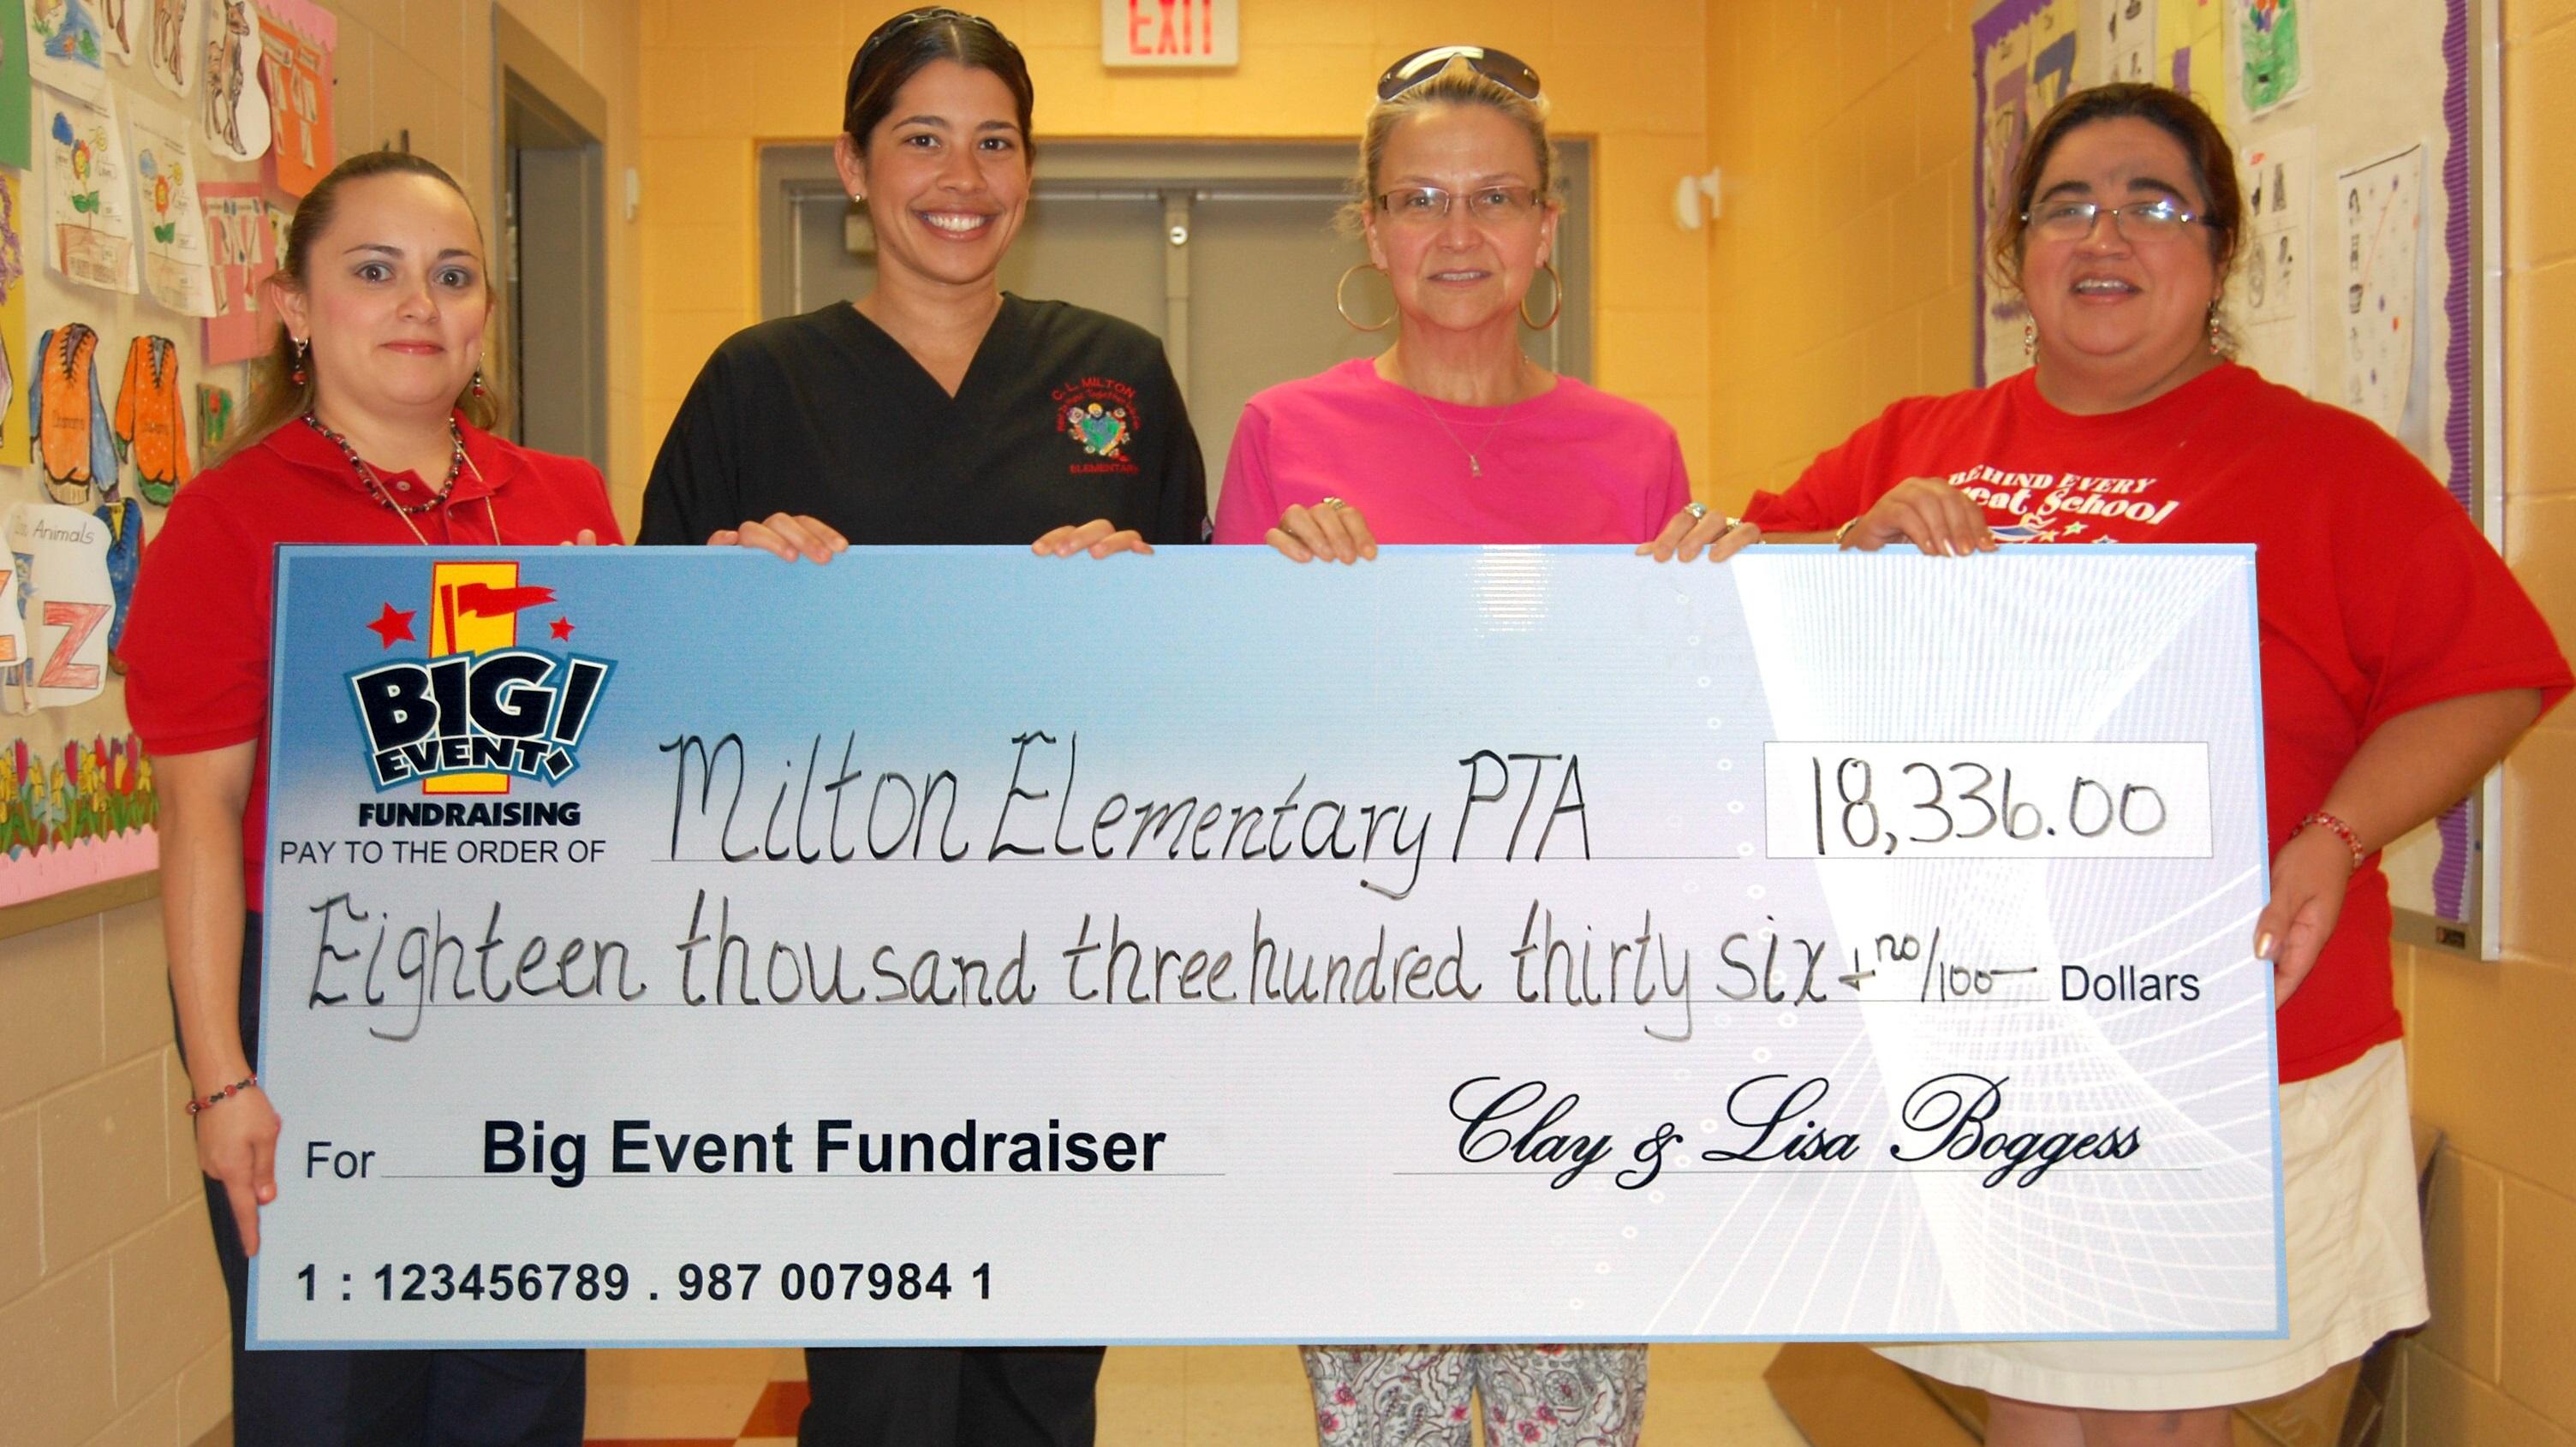 Milton Elementary School PTA fundraising team holding check